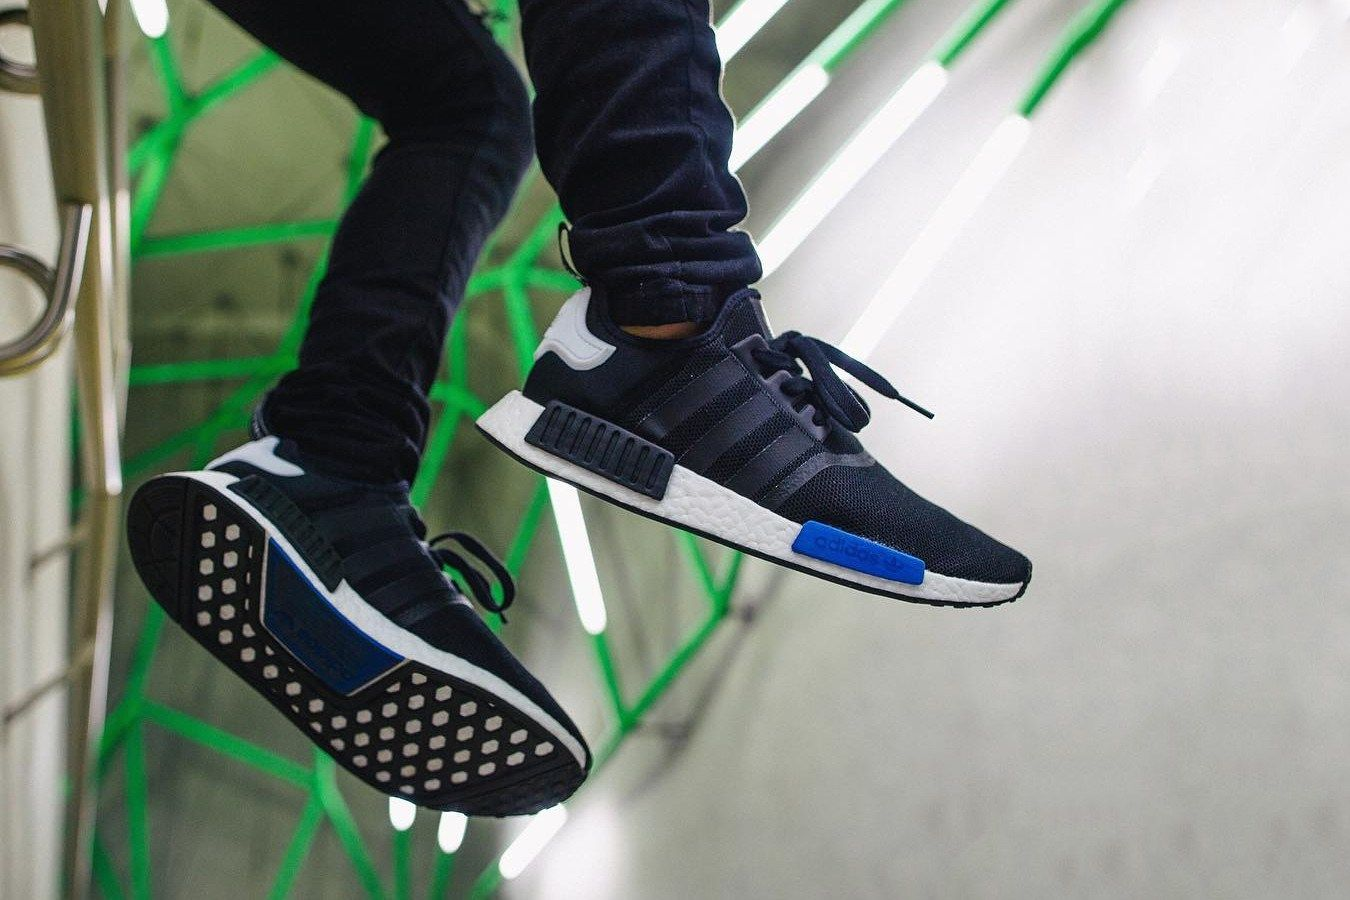 Adidas NMD Runner City Pack | Chaussures adidas, Adidas et